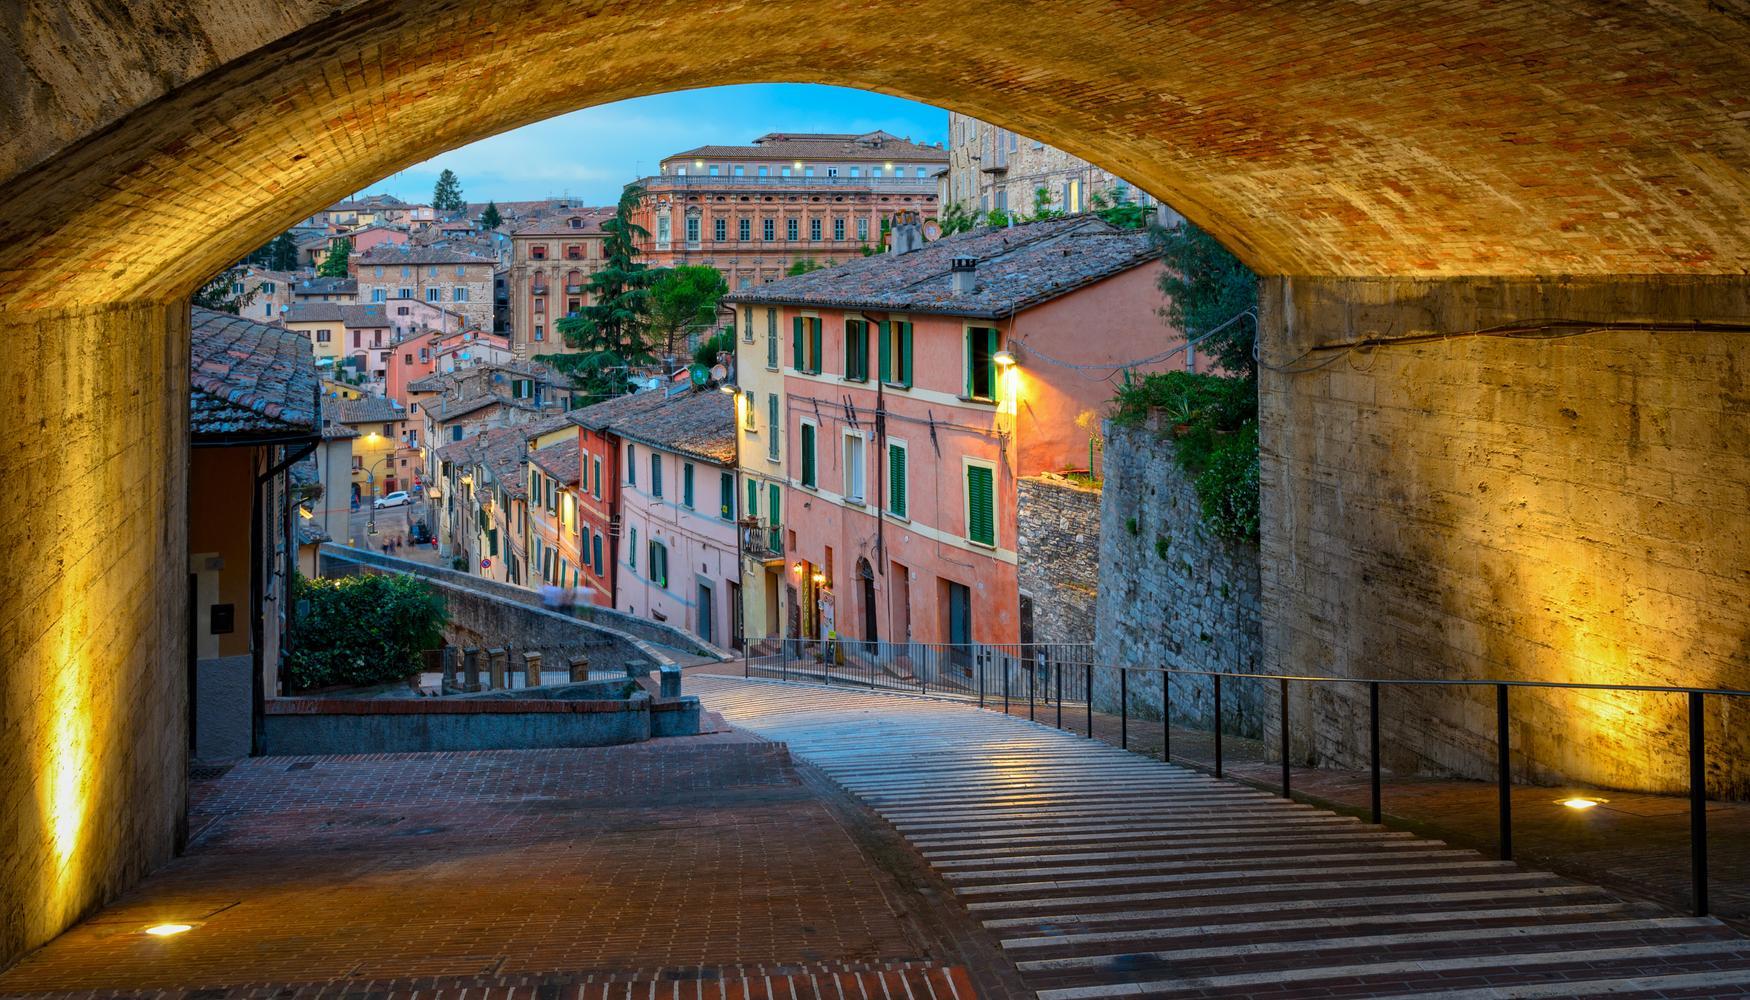 佩鲁贾 Perugia San Francesco d'Assisi - Umbria International Airport的租车